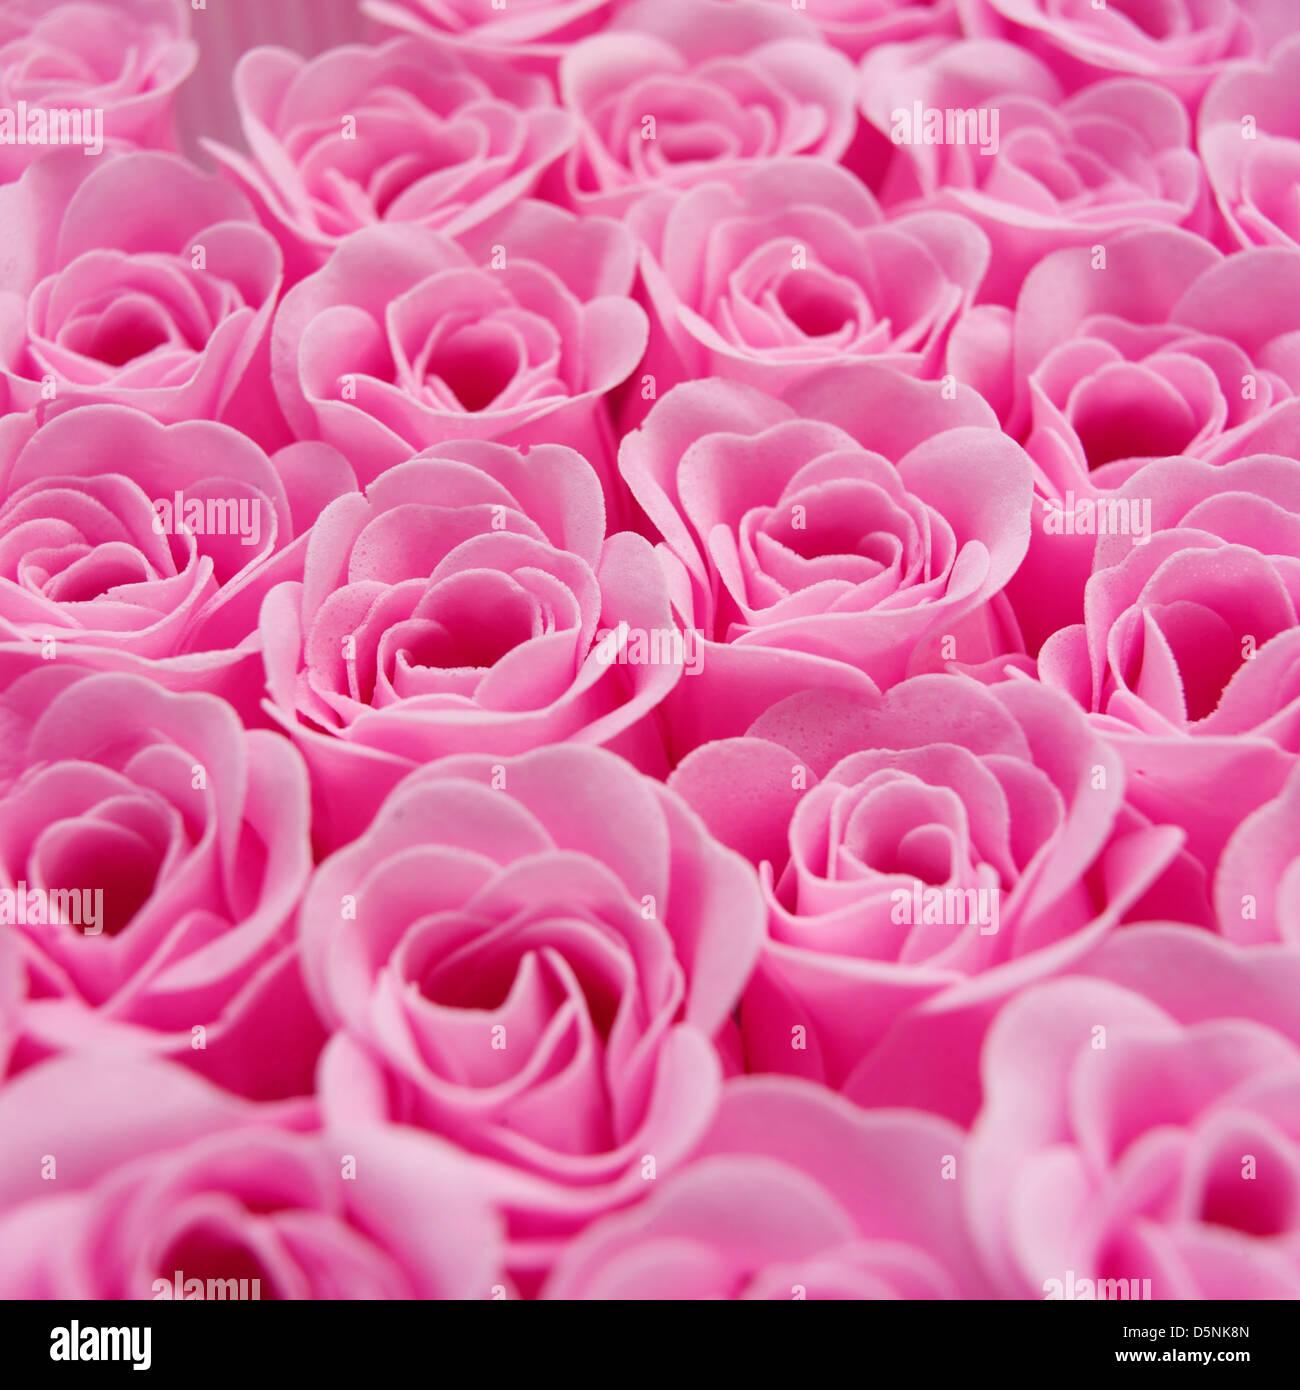 Roses roses artificielles Photo Stock